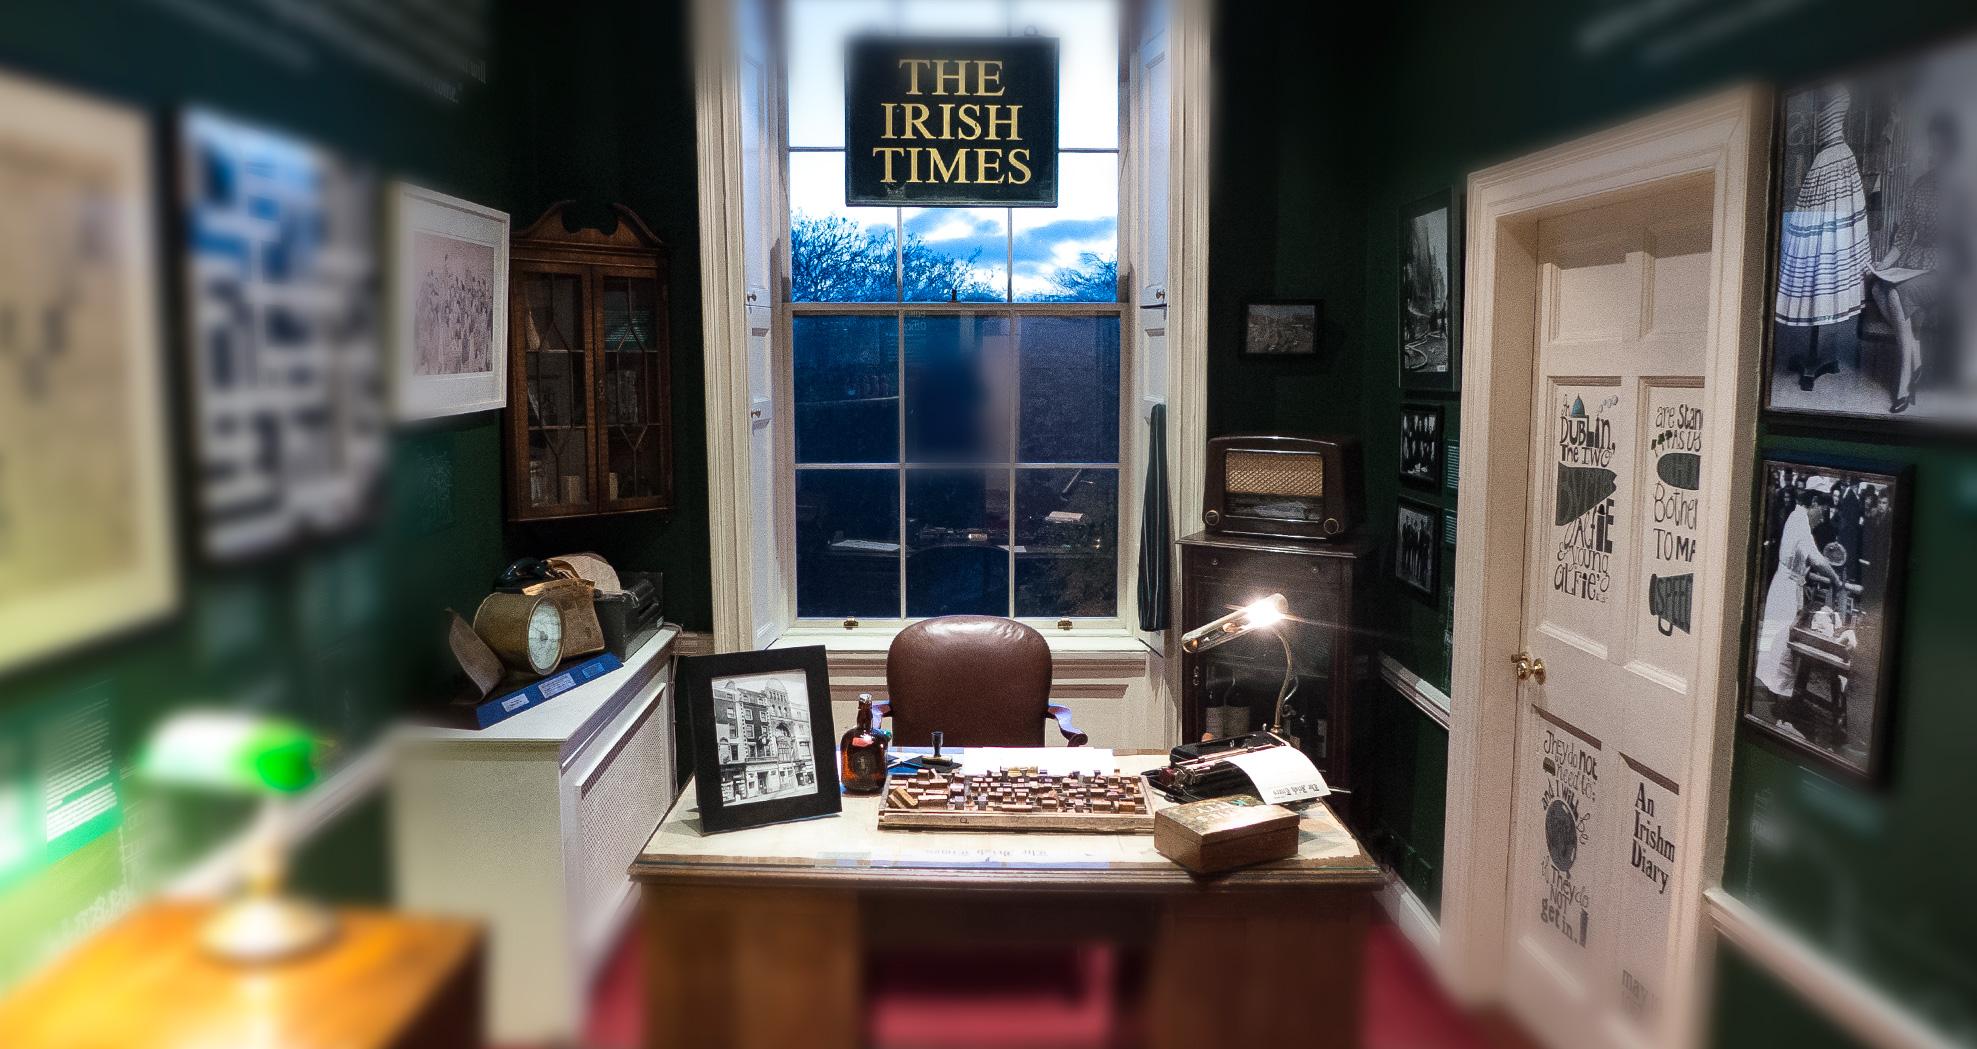 dublin irish times gallery